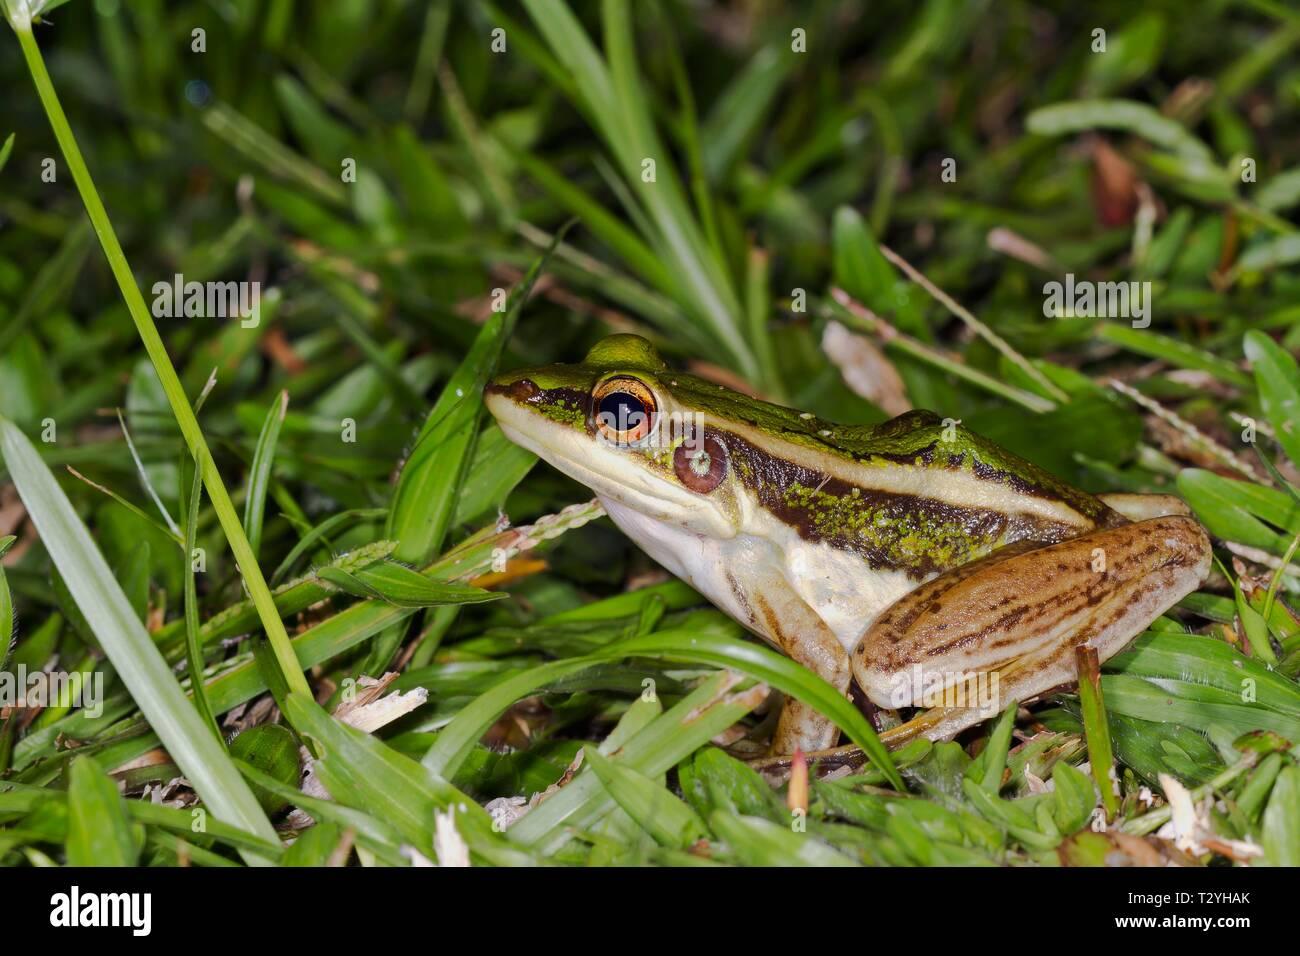 Common green frog (Hylarana erythraea), Sepilok Nature Reserve, Sabah, Borneo, Malaysia - Stock Image